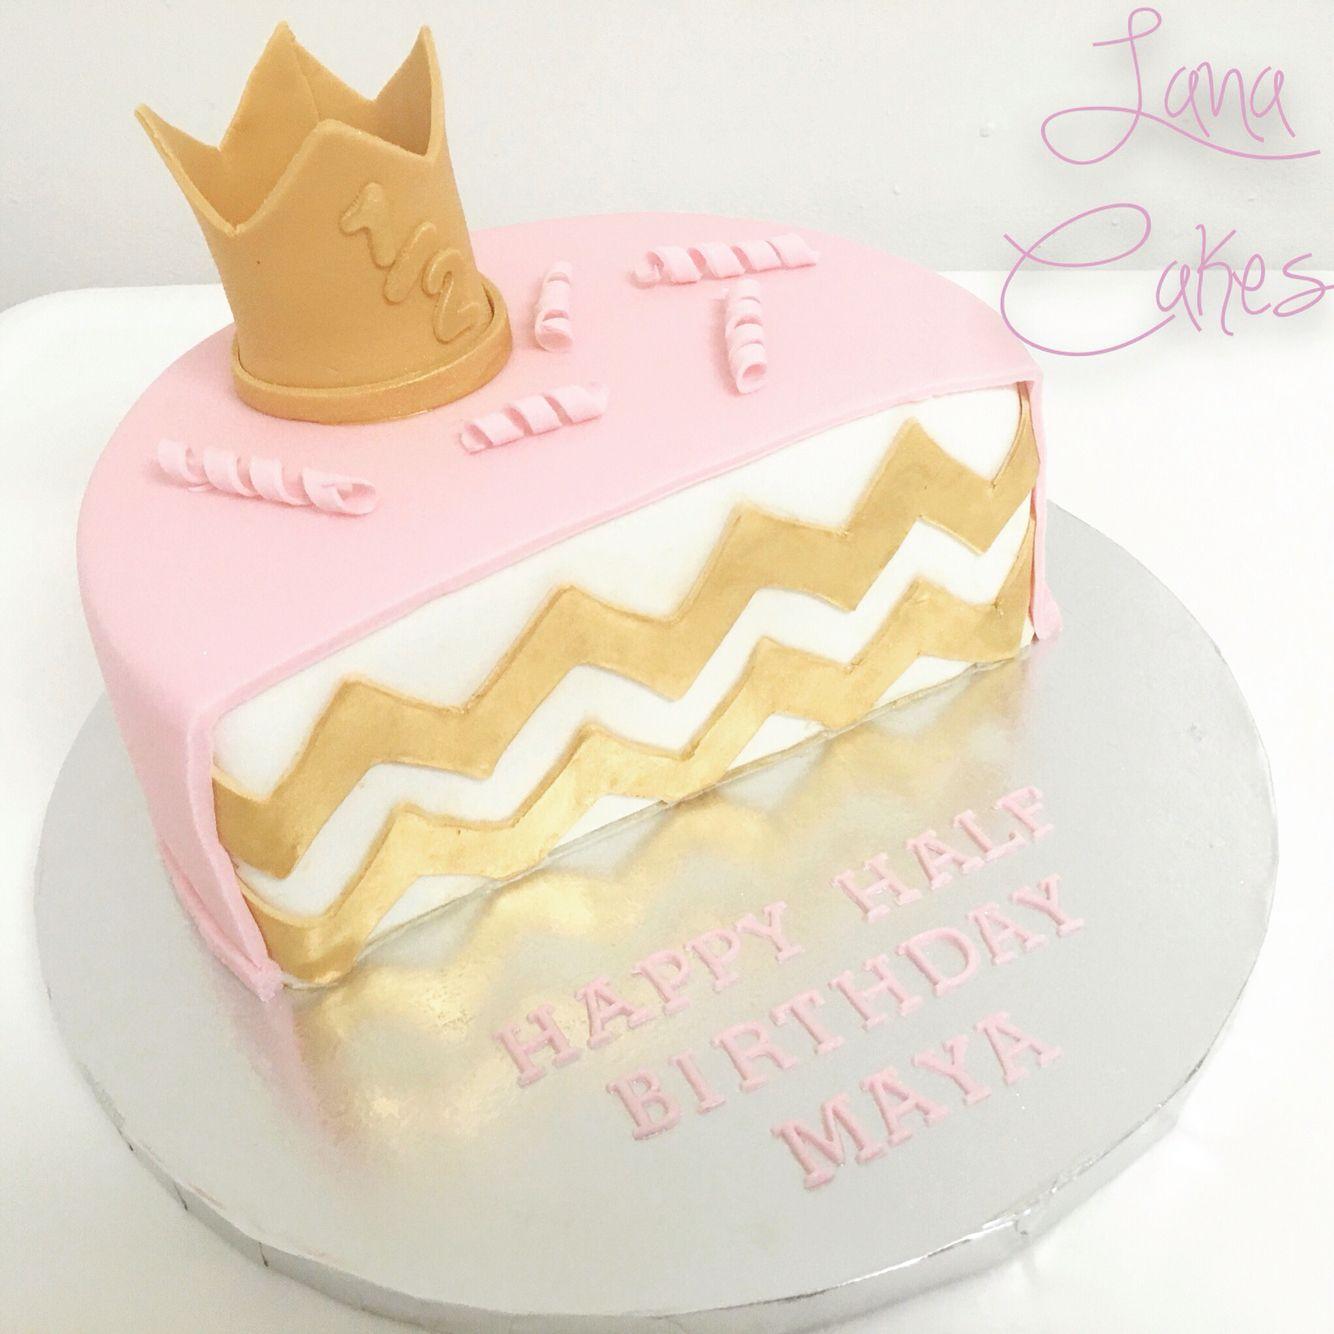 Half Birthday Cake by Lana Cakes Cakes Pinterest Half birthday